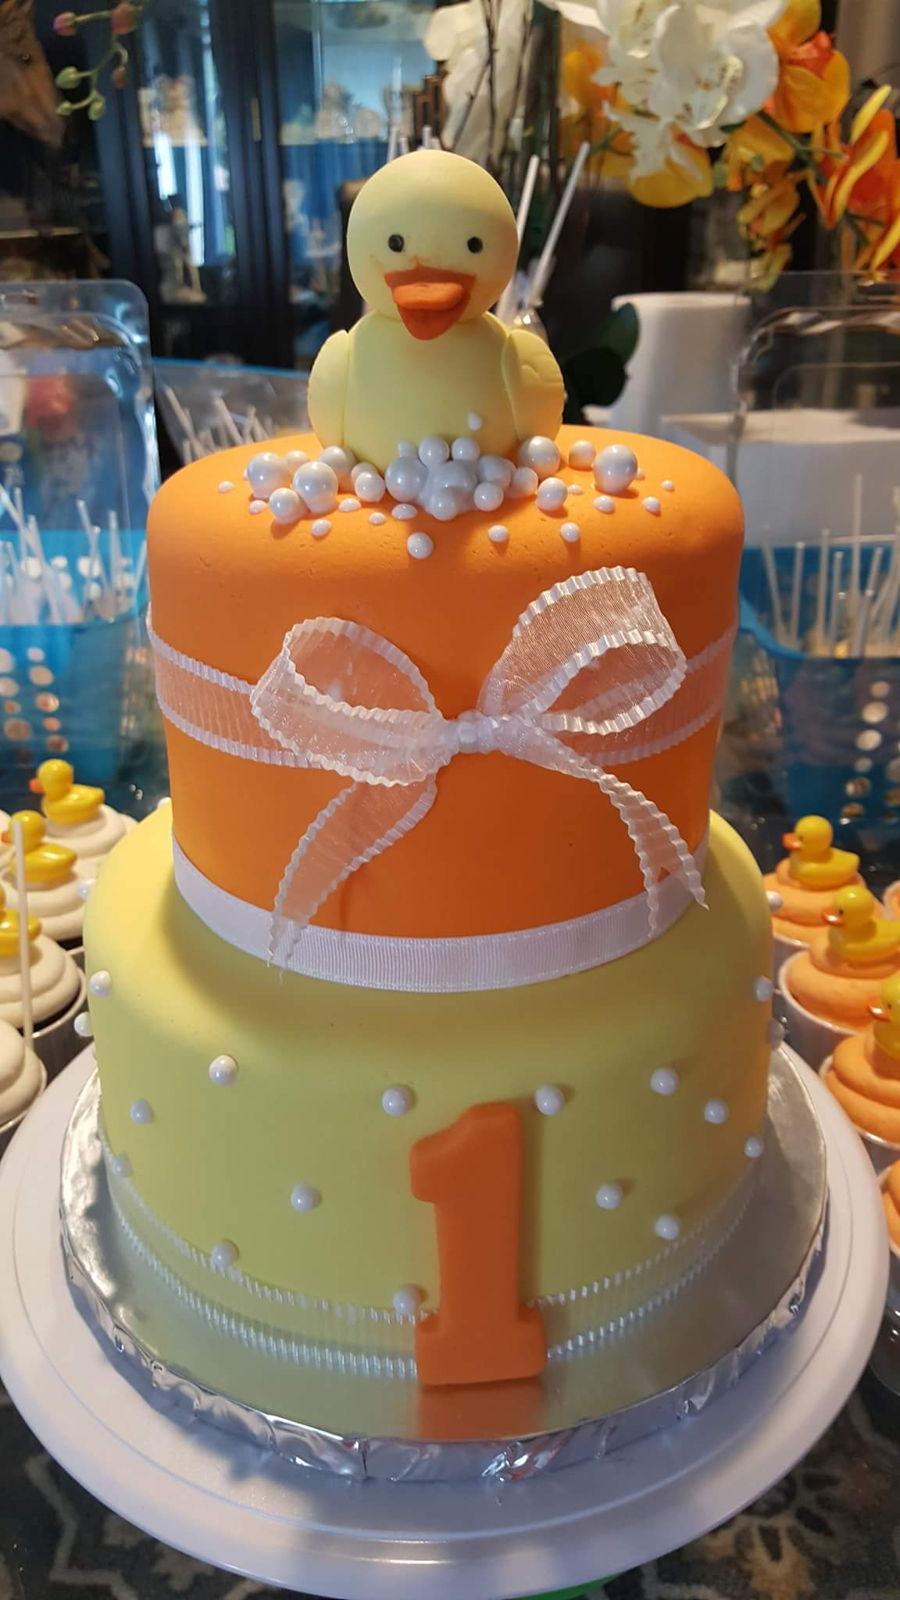 Excellent Rubber Duckie 1St Birthday Cake Cakecentral Com Funny Birthday Cards Online Inifodamsfinfo